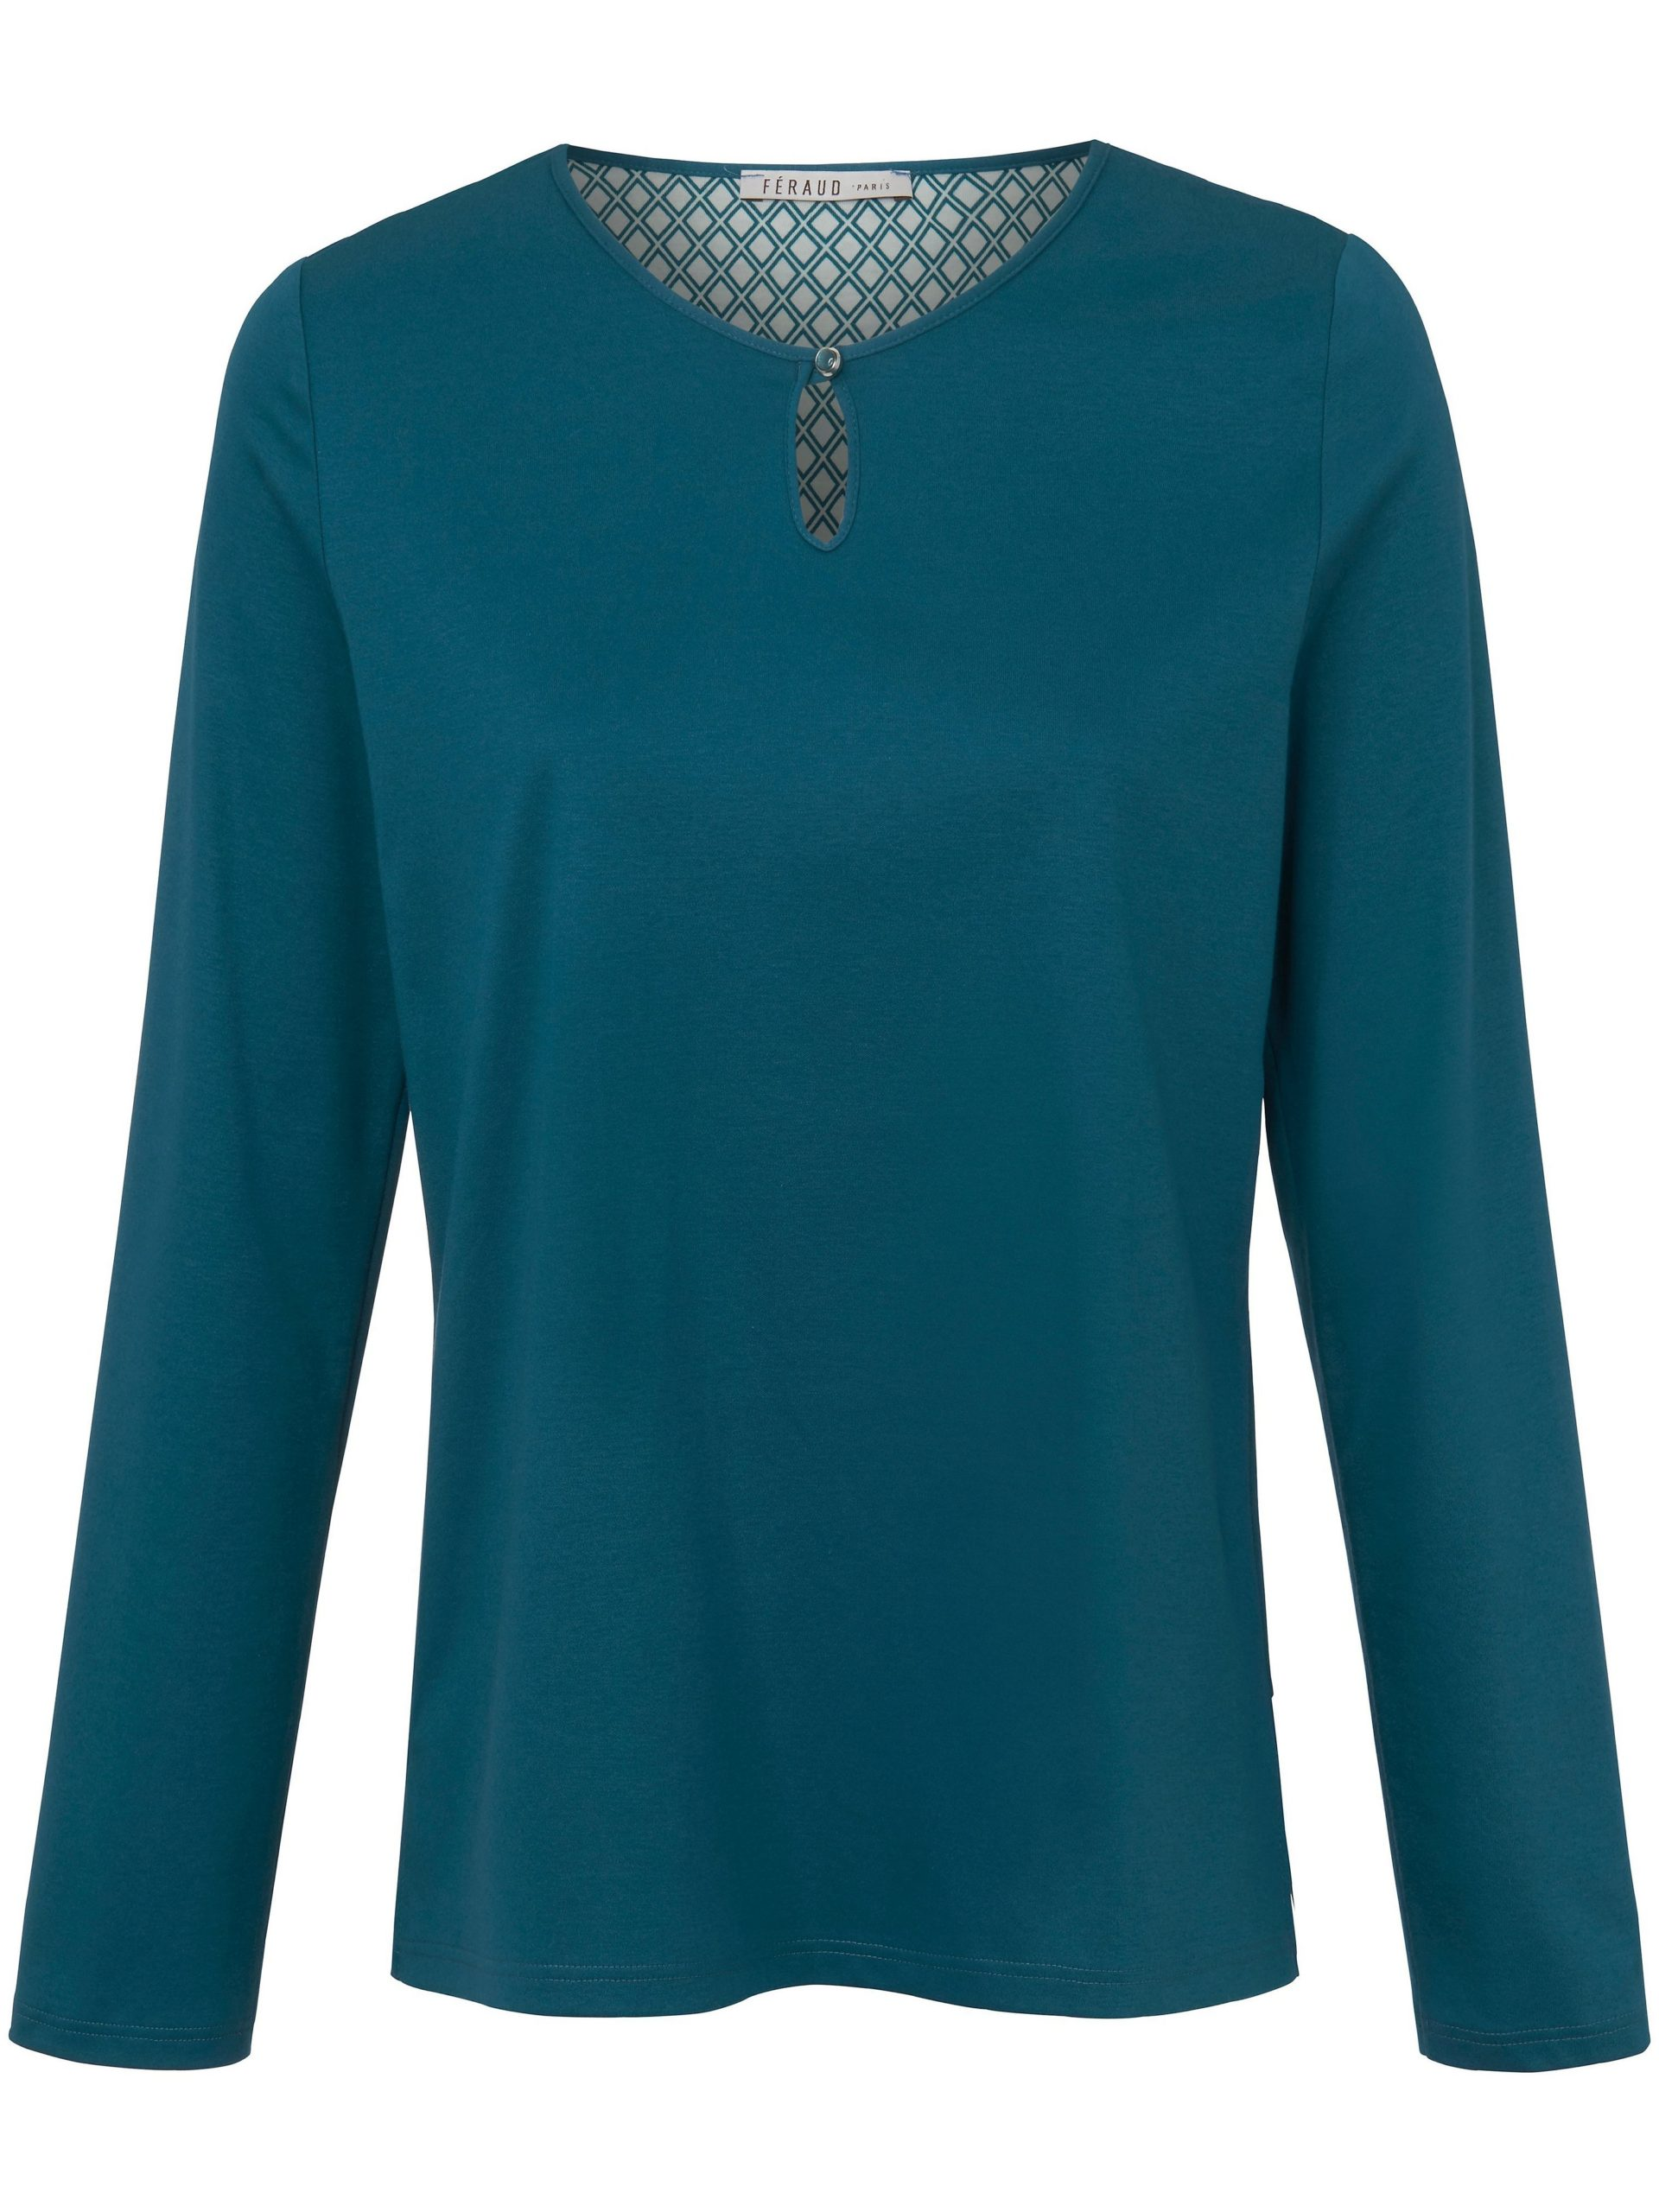 Pyjama Van Féraud turquoise Kopen